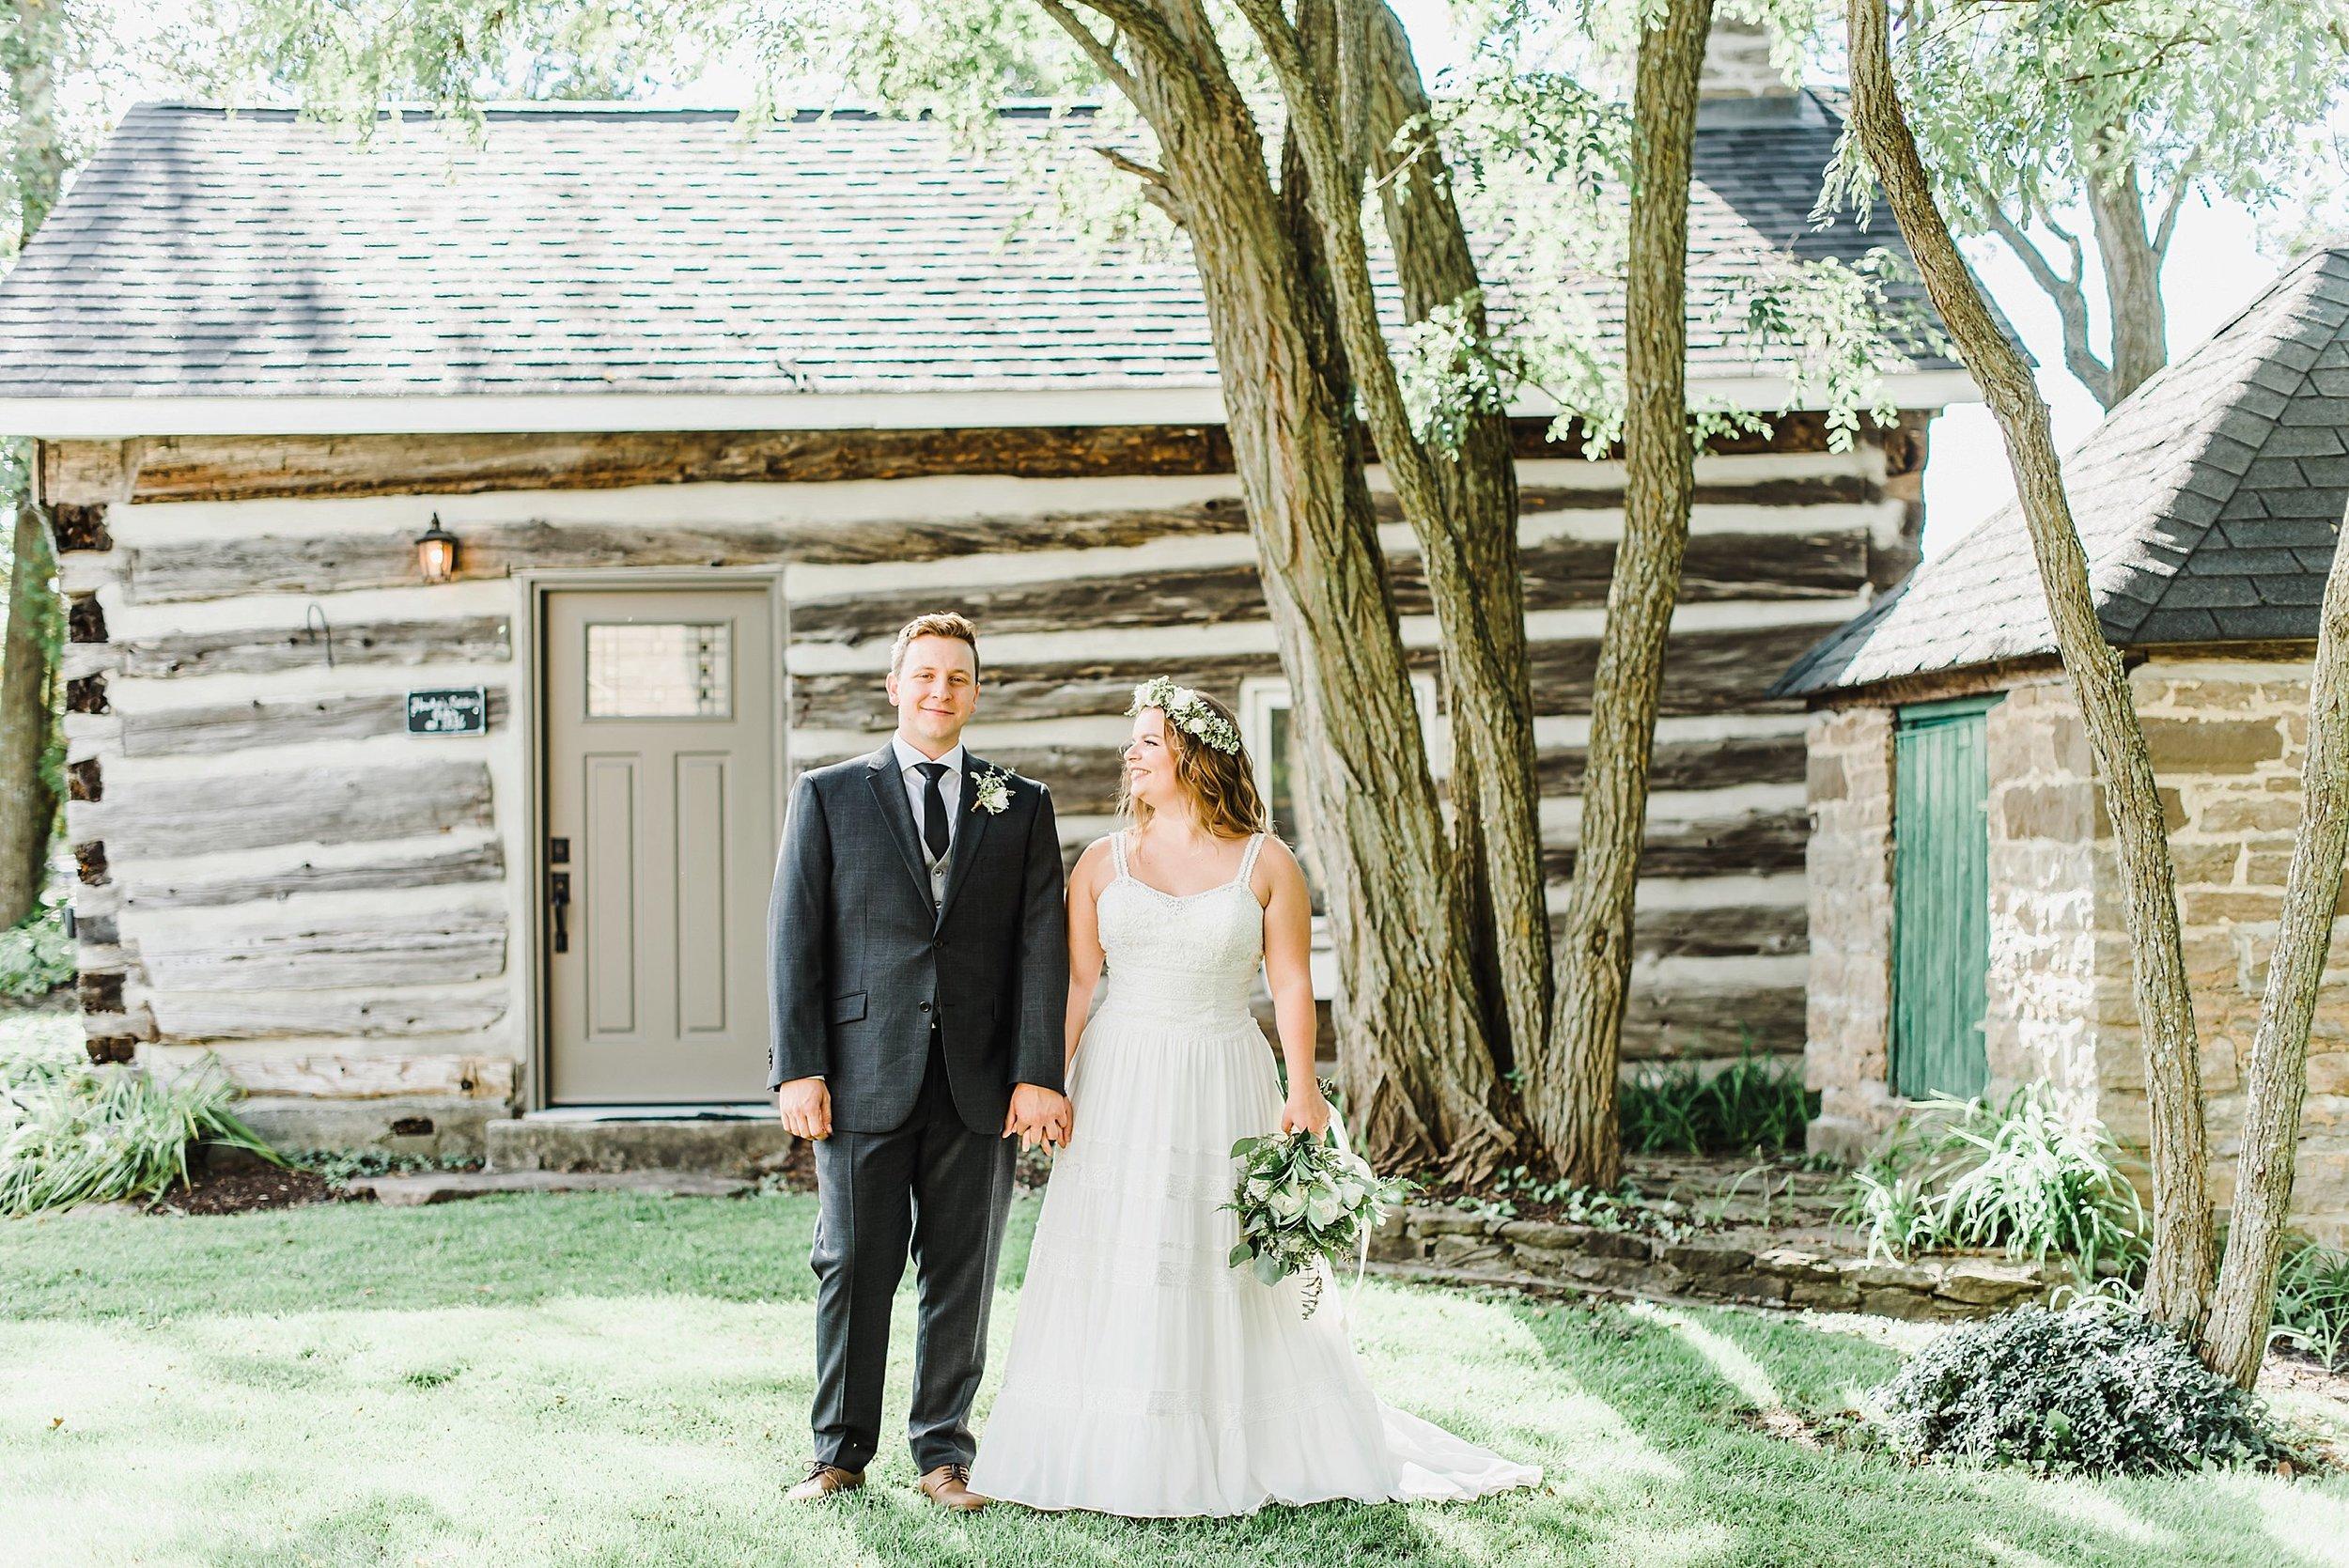 light airy indie fine art ottawa wedding photographer | Ali and Batoul Photography_1103.jpg